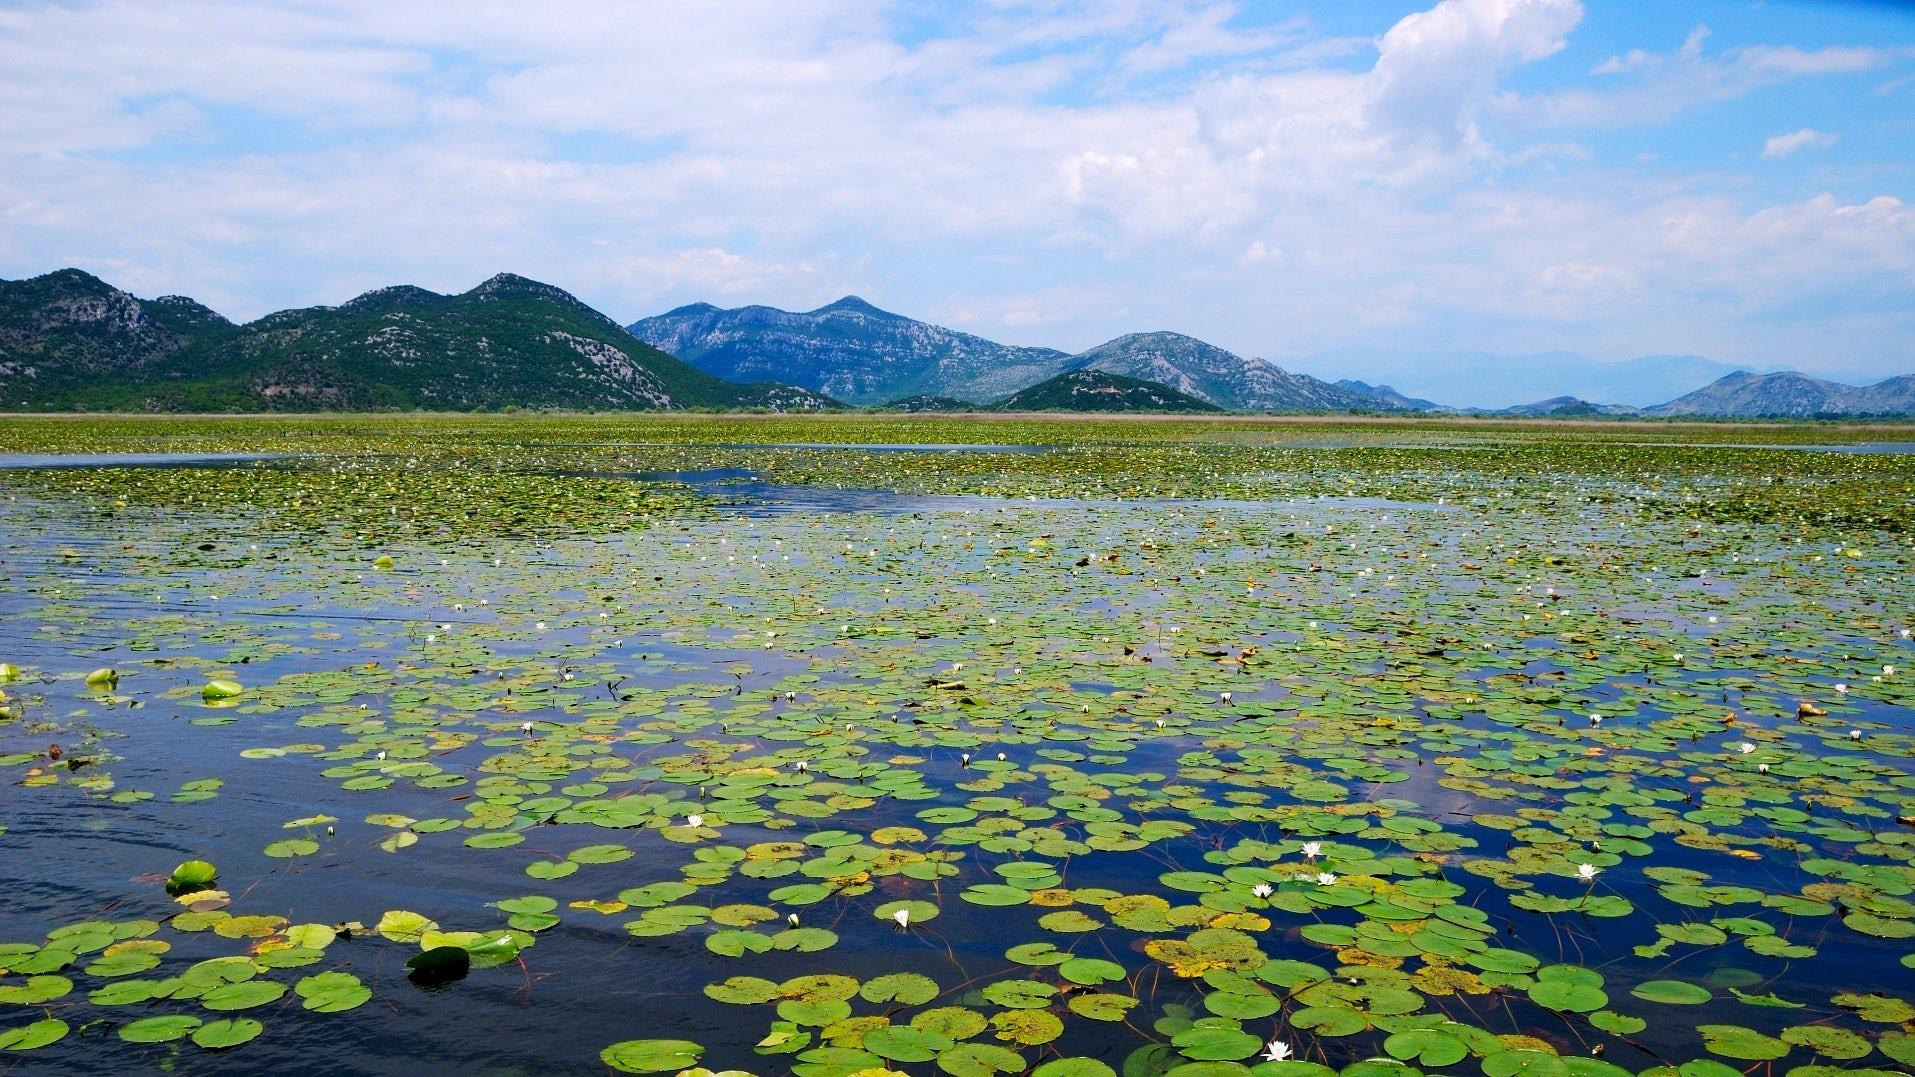 Skadar Lake - a natural jewel of Montenegro